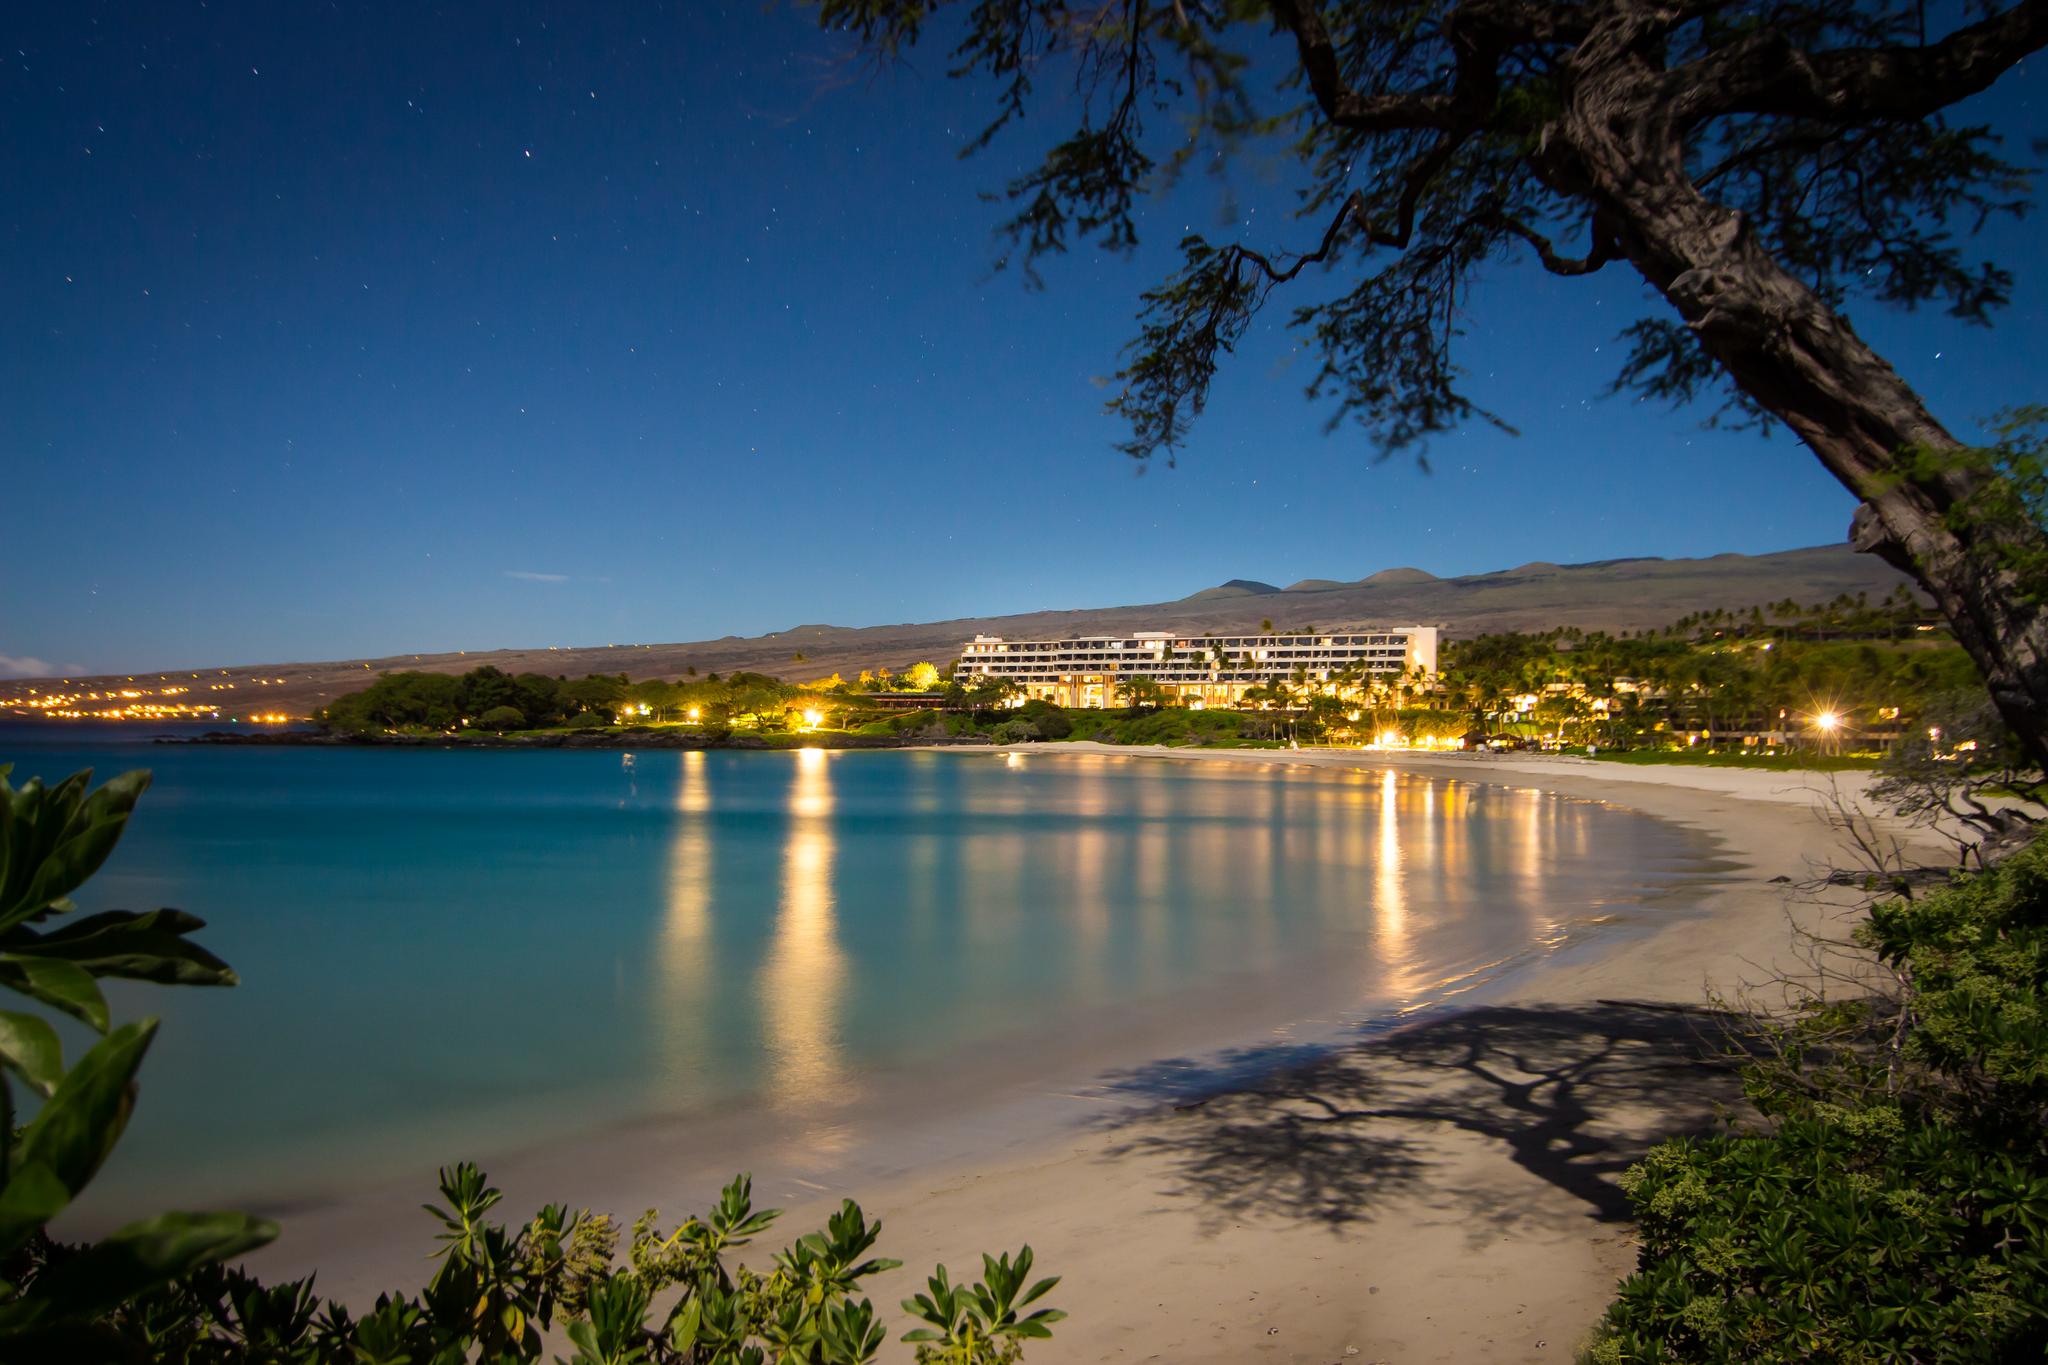 mauna kea resort - HD2048×1365